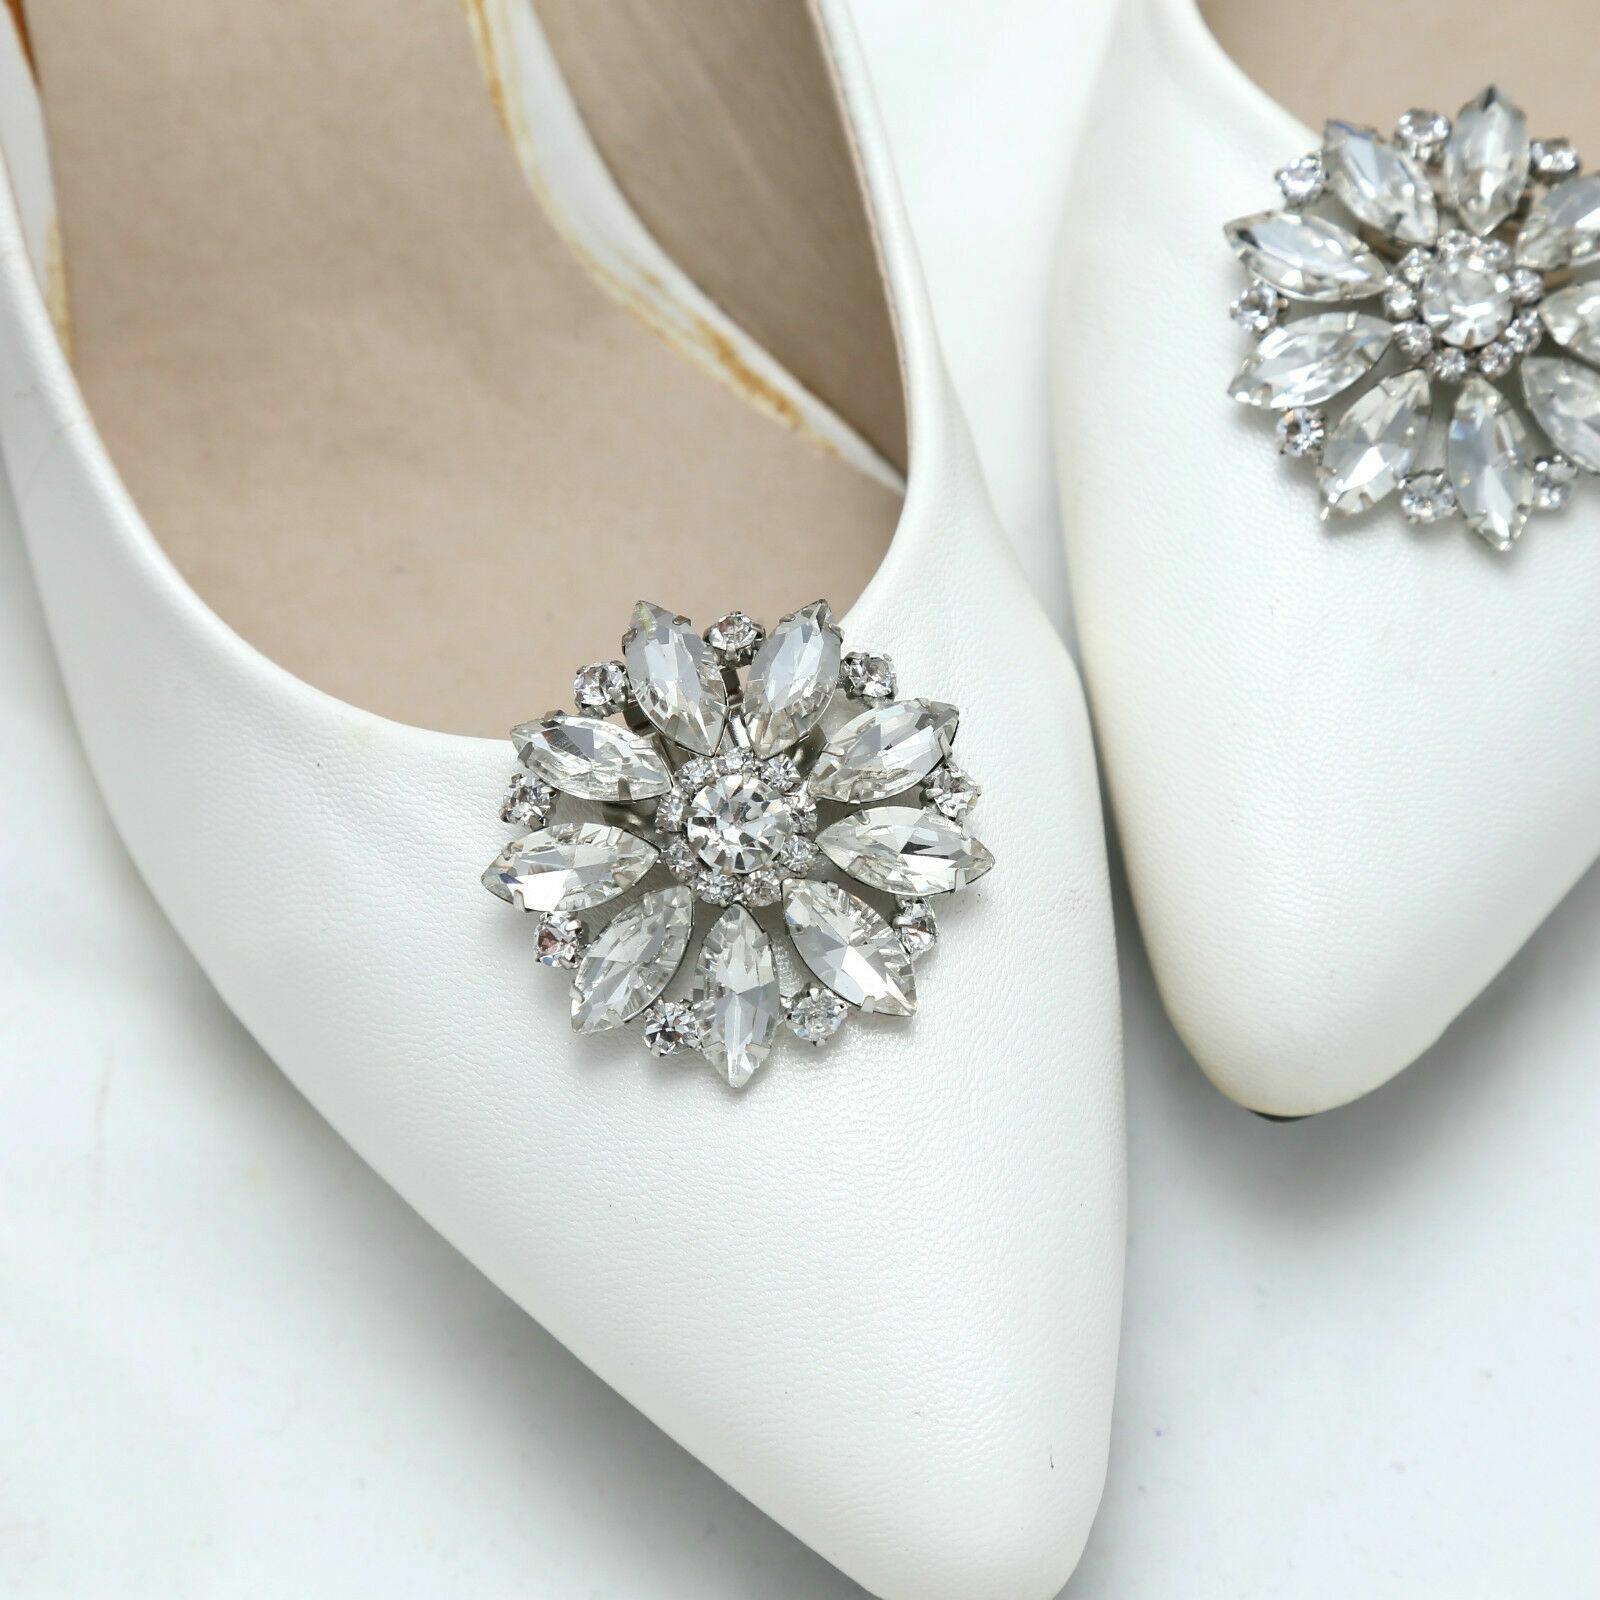 2 Pcs Rhinestone Crystal Round Style Wedding Shoe Clips Shoe Charms